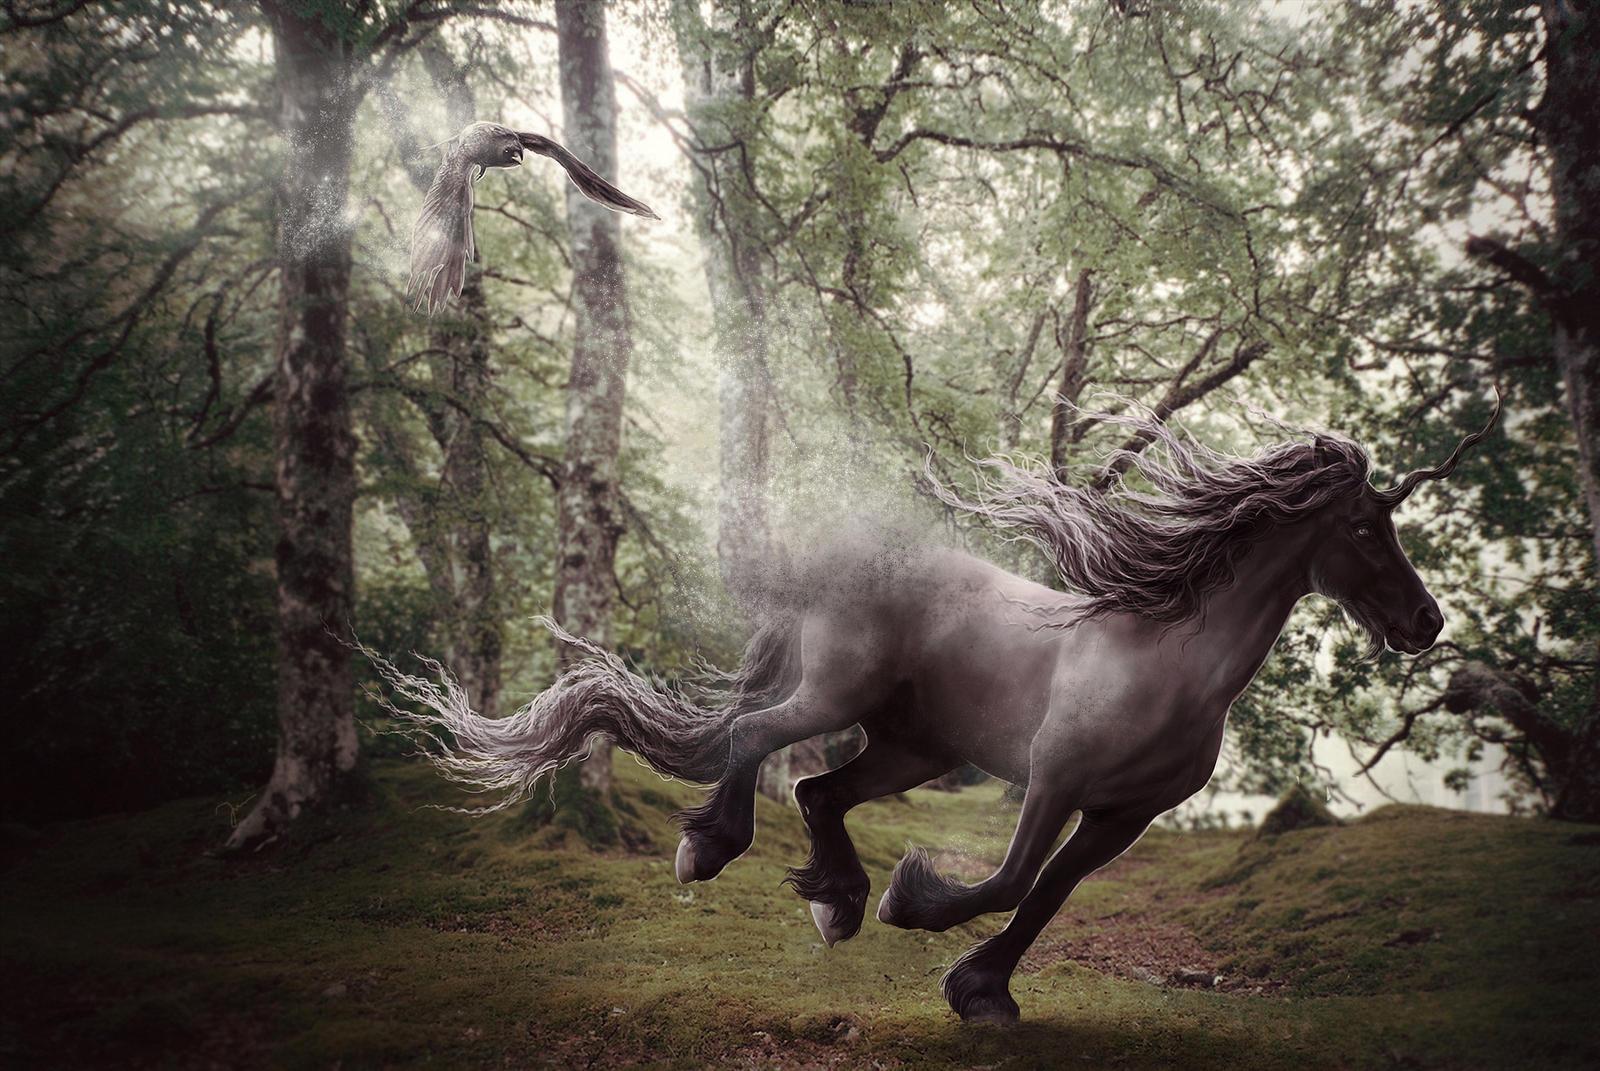 Silver Soul by Rimfy